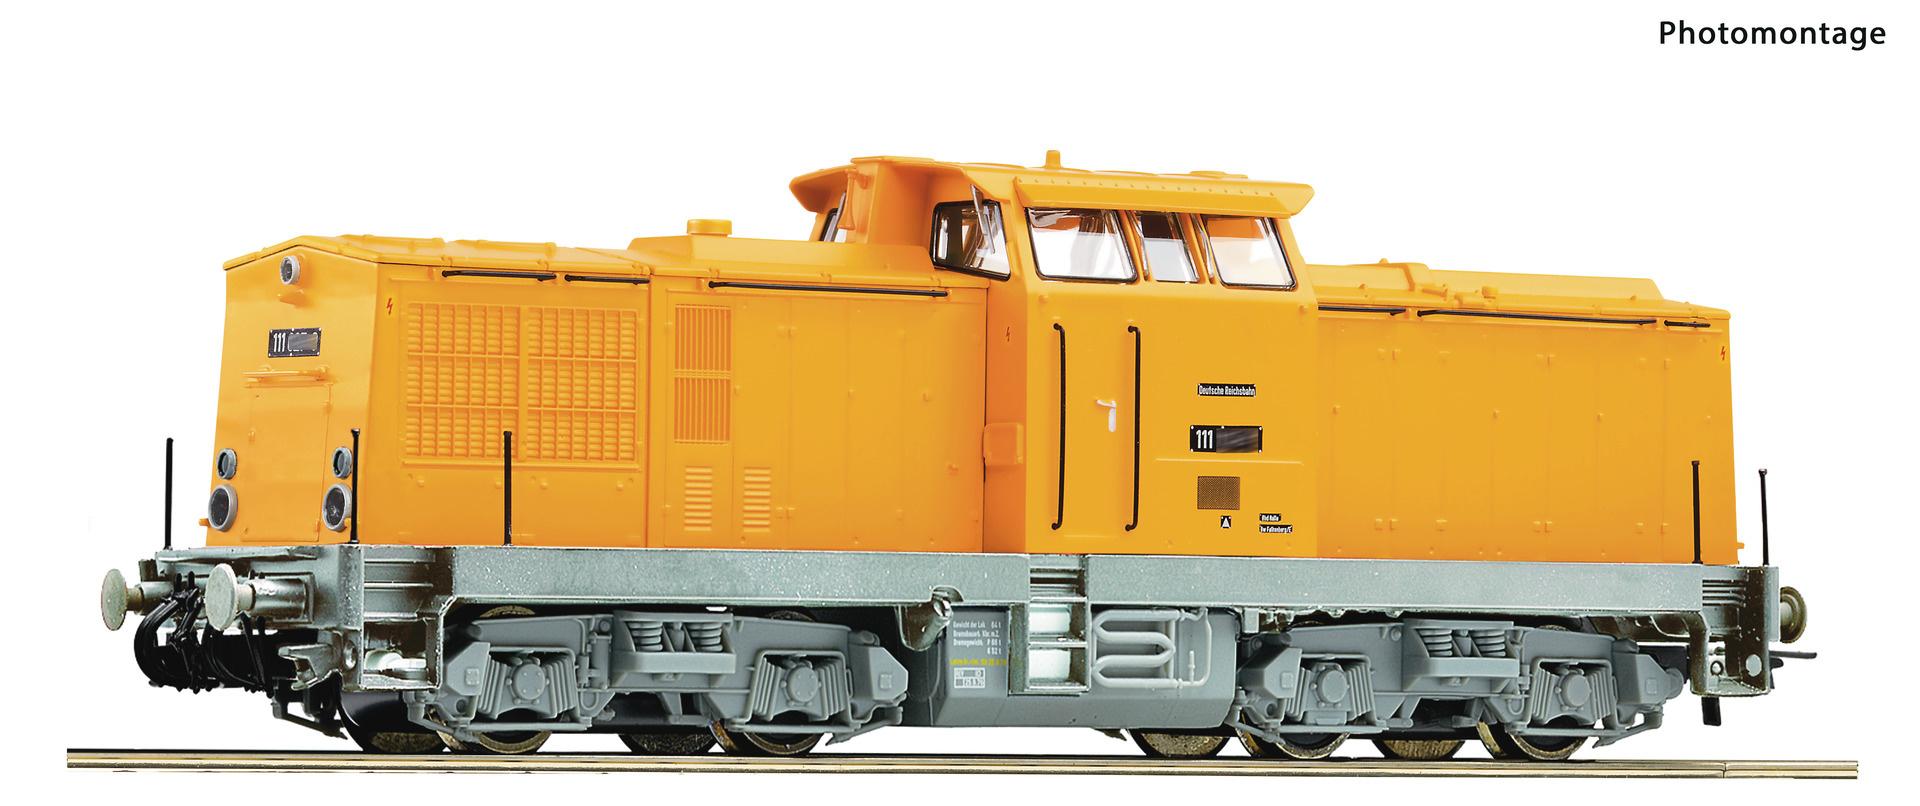 70813 Diesellok BR 111 orange-1